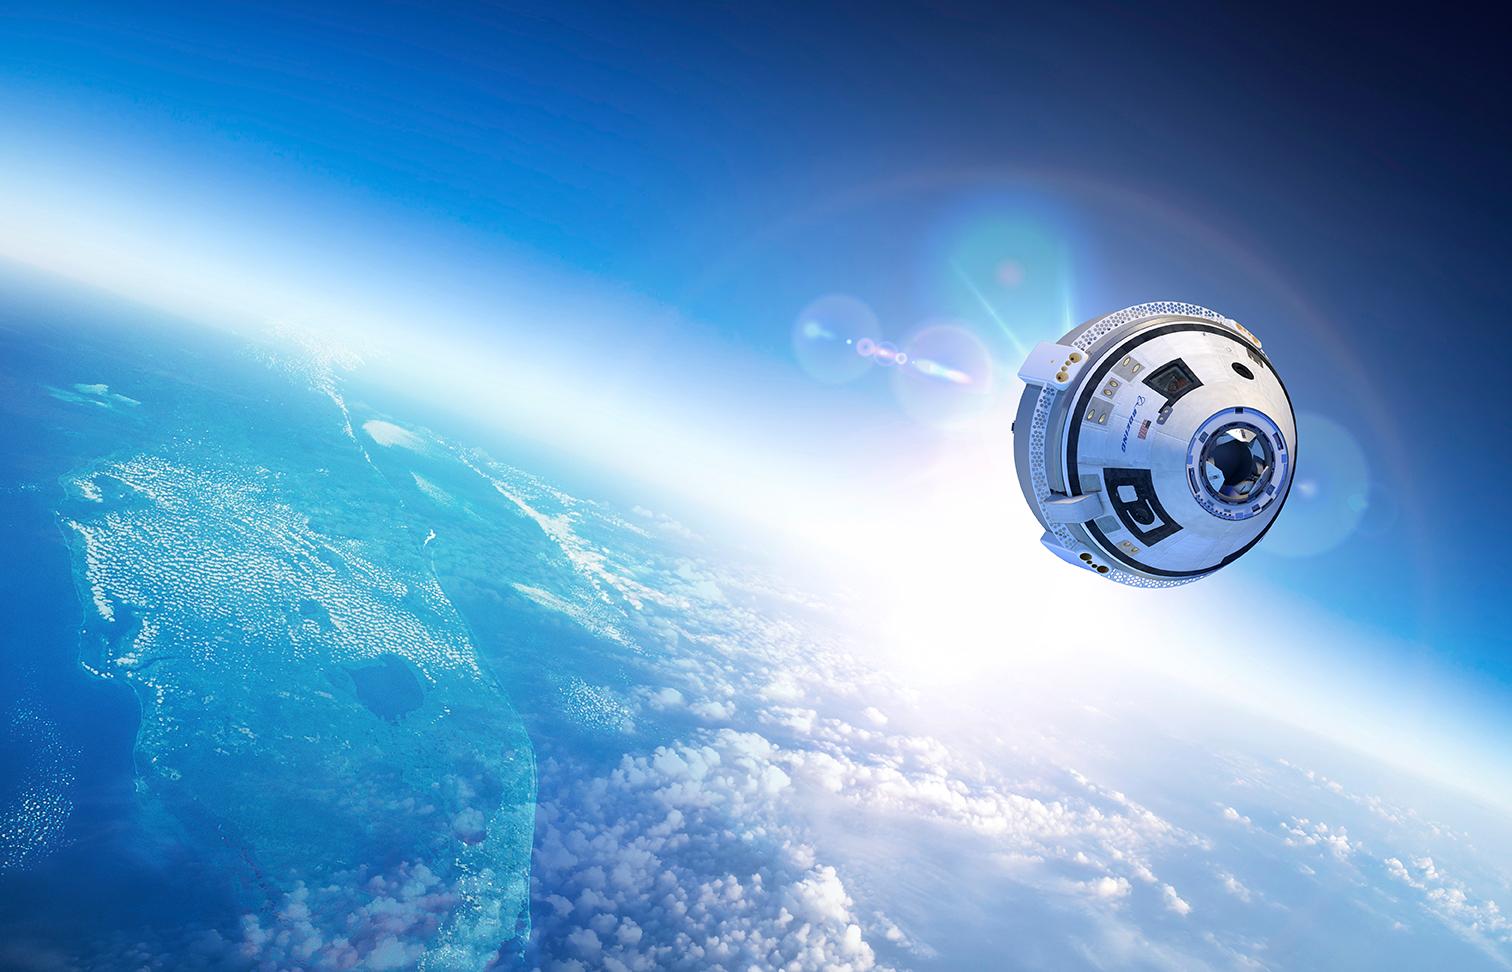 sursa imaginii http://www.vox.com/2015/9/4/9261613/boeing-starliner-nasa-space-station